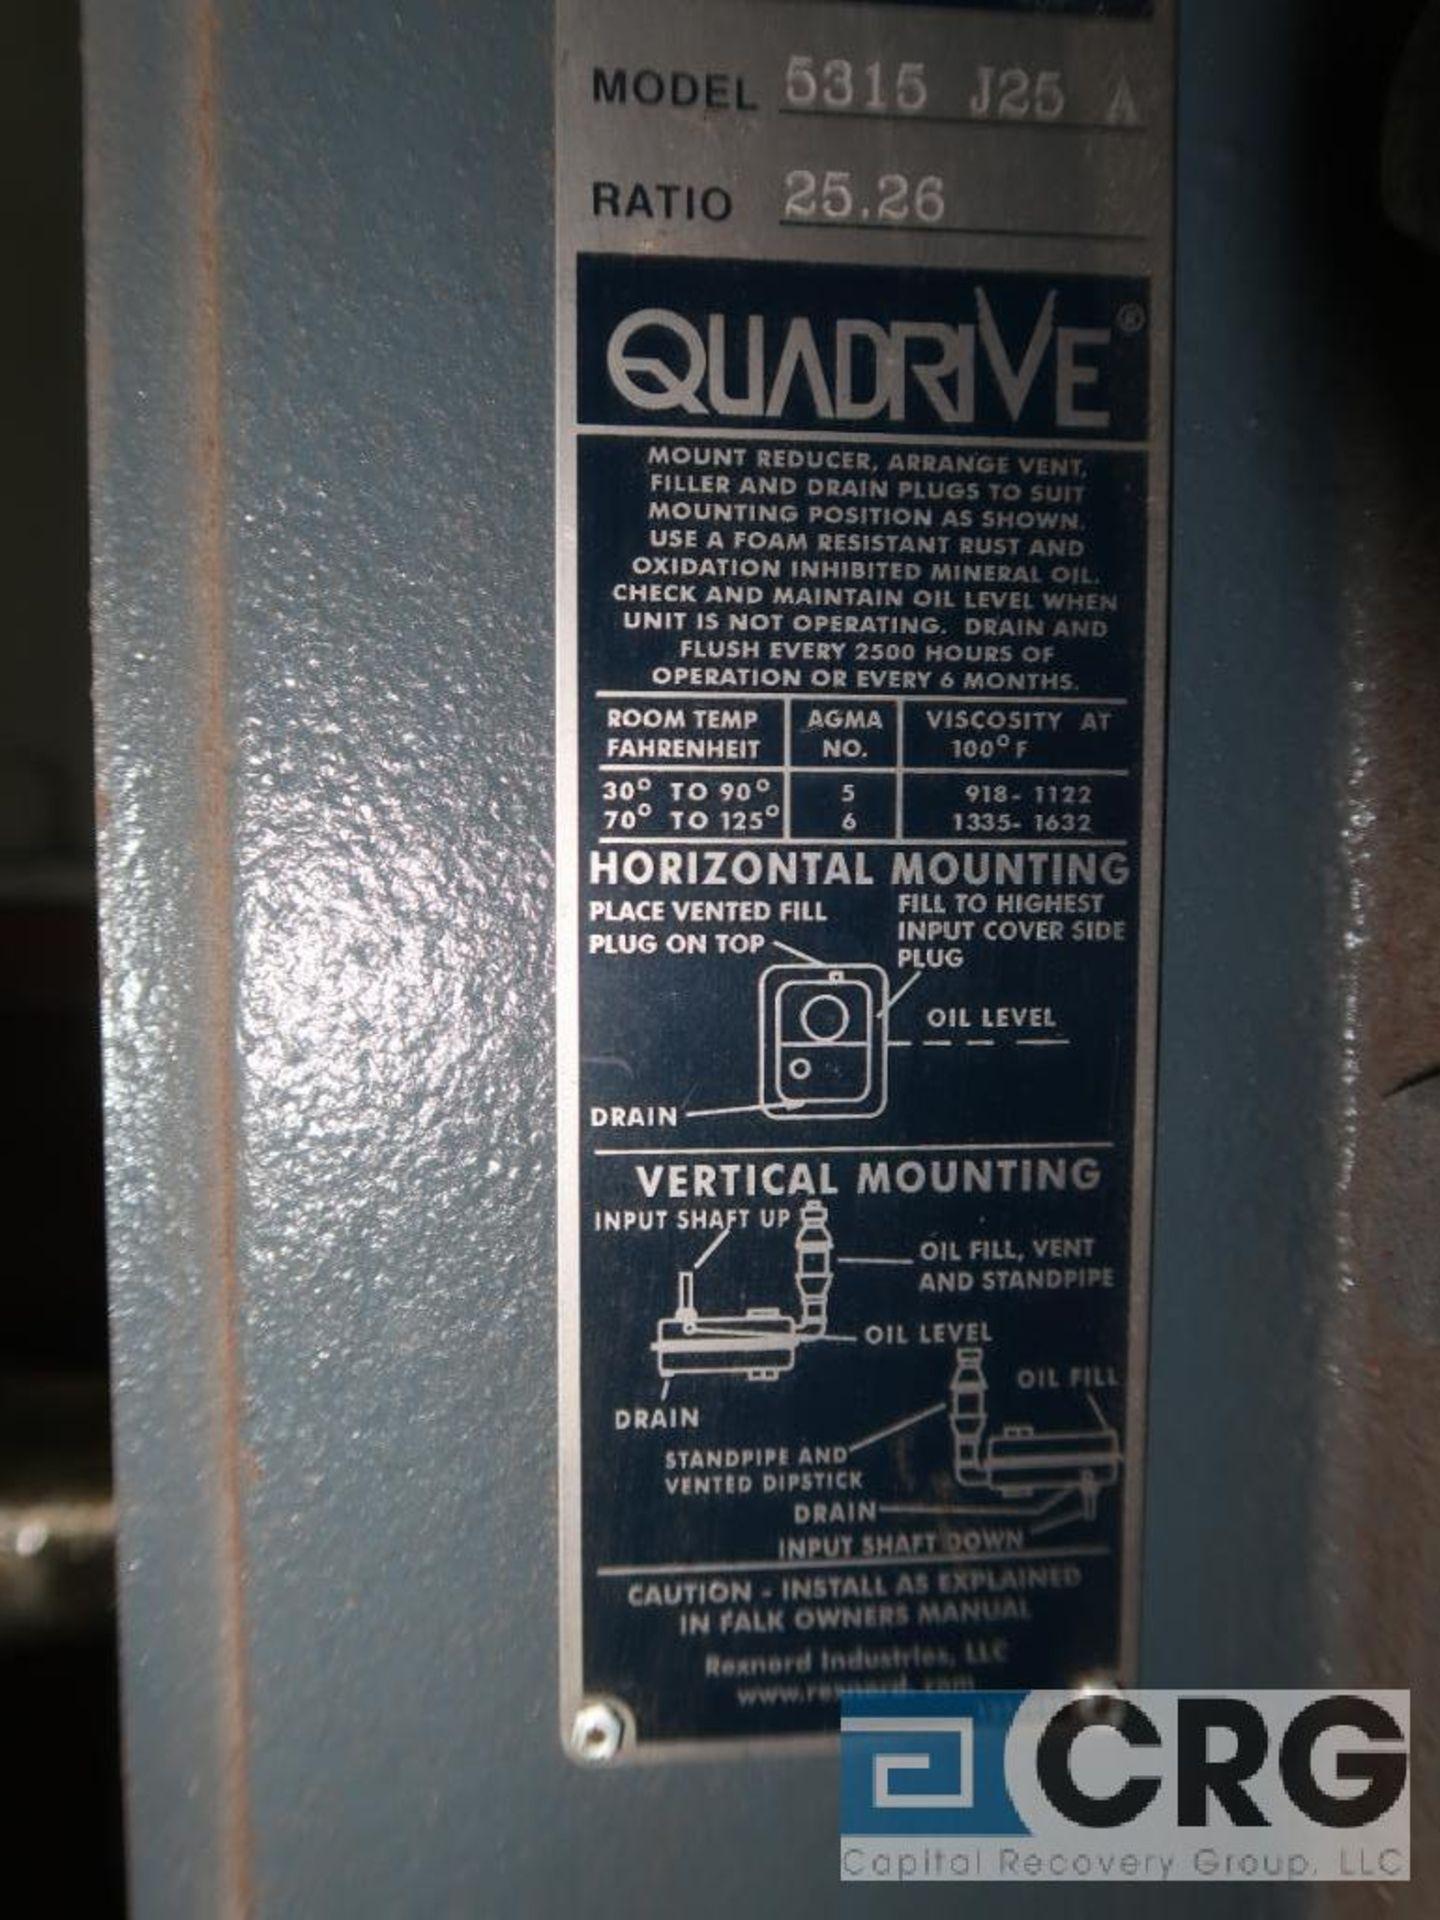 Falk 5315 J25A quadrive gear, ratio 25.26 (Finish Building) - Image 2 of 2